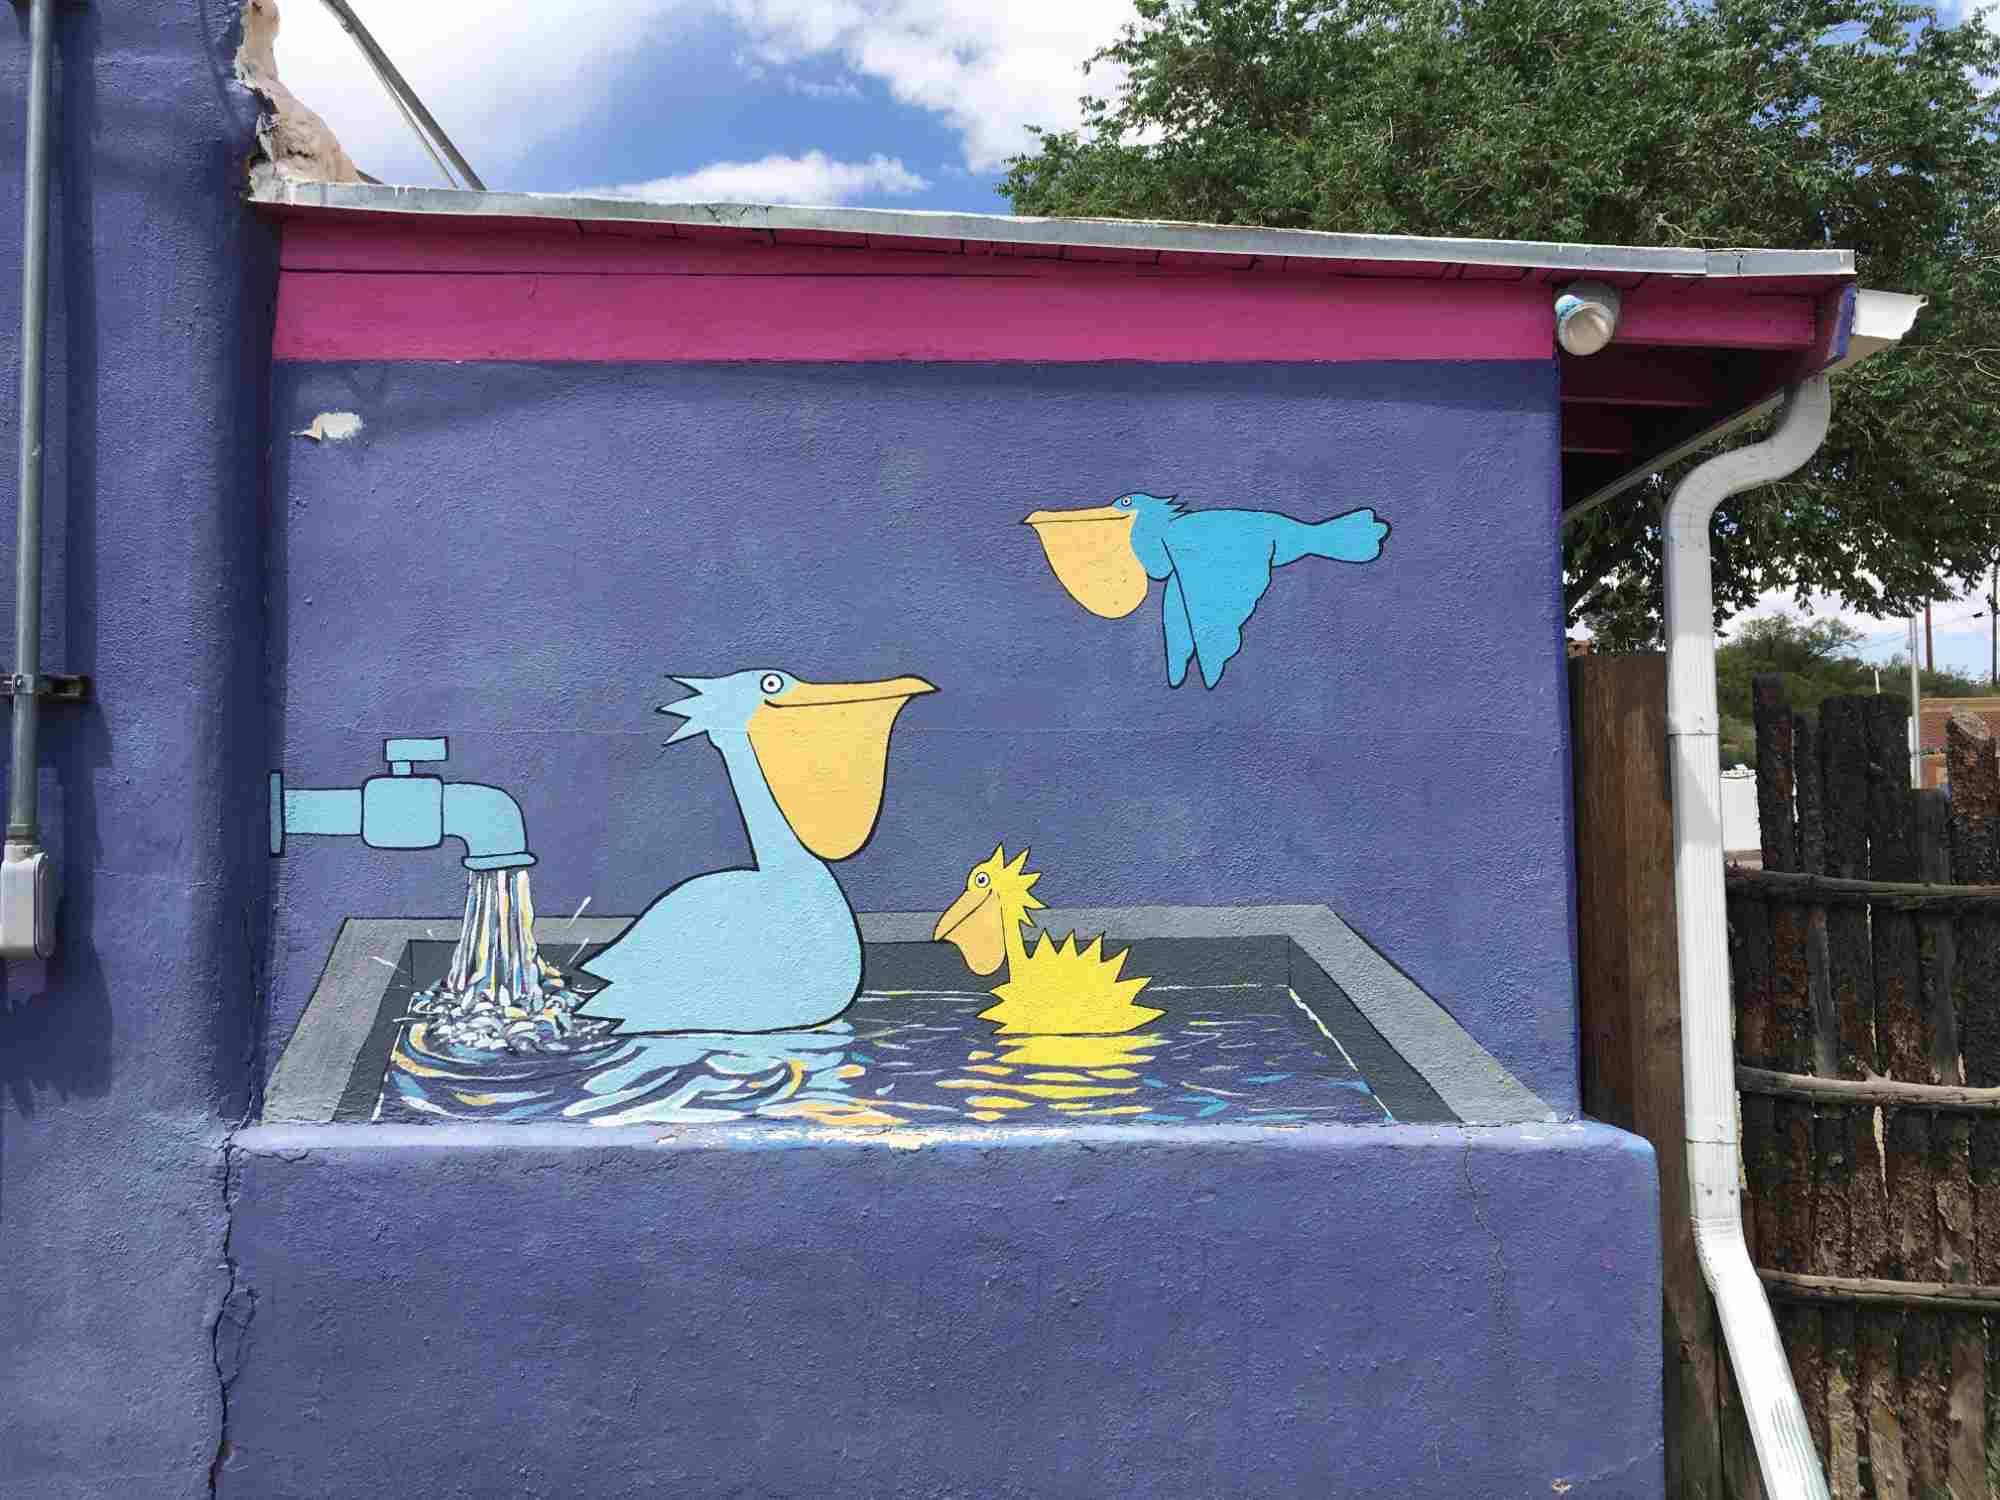 Pelicans soaking in hot springs - Pelican Spa alley near A&B Drive In